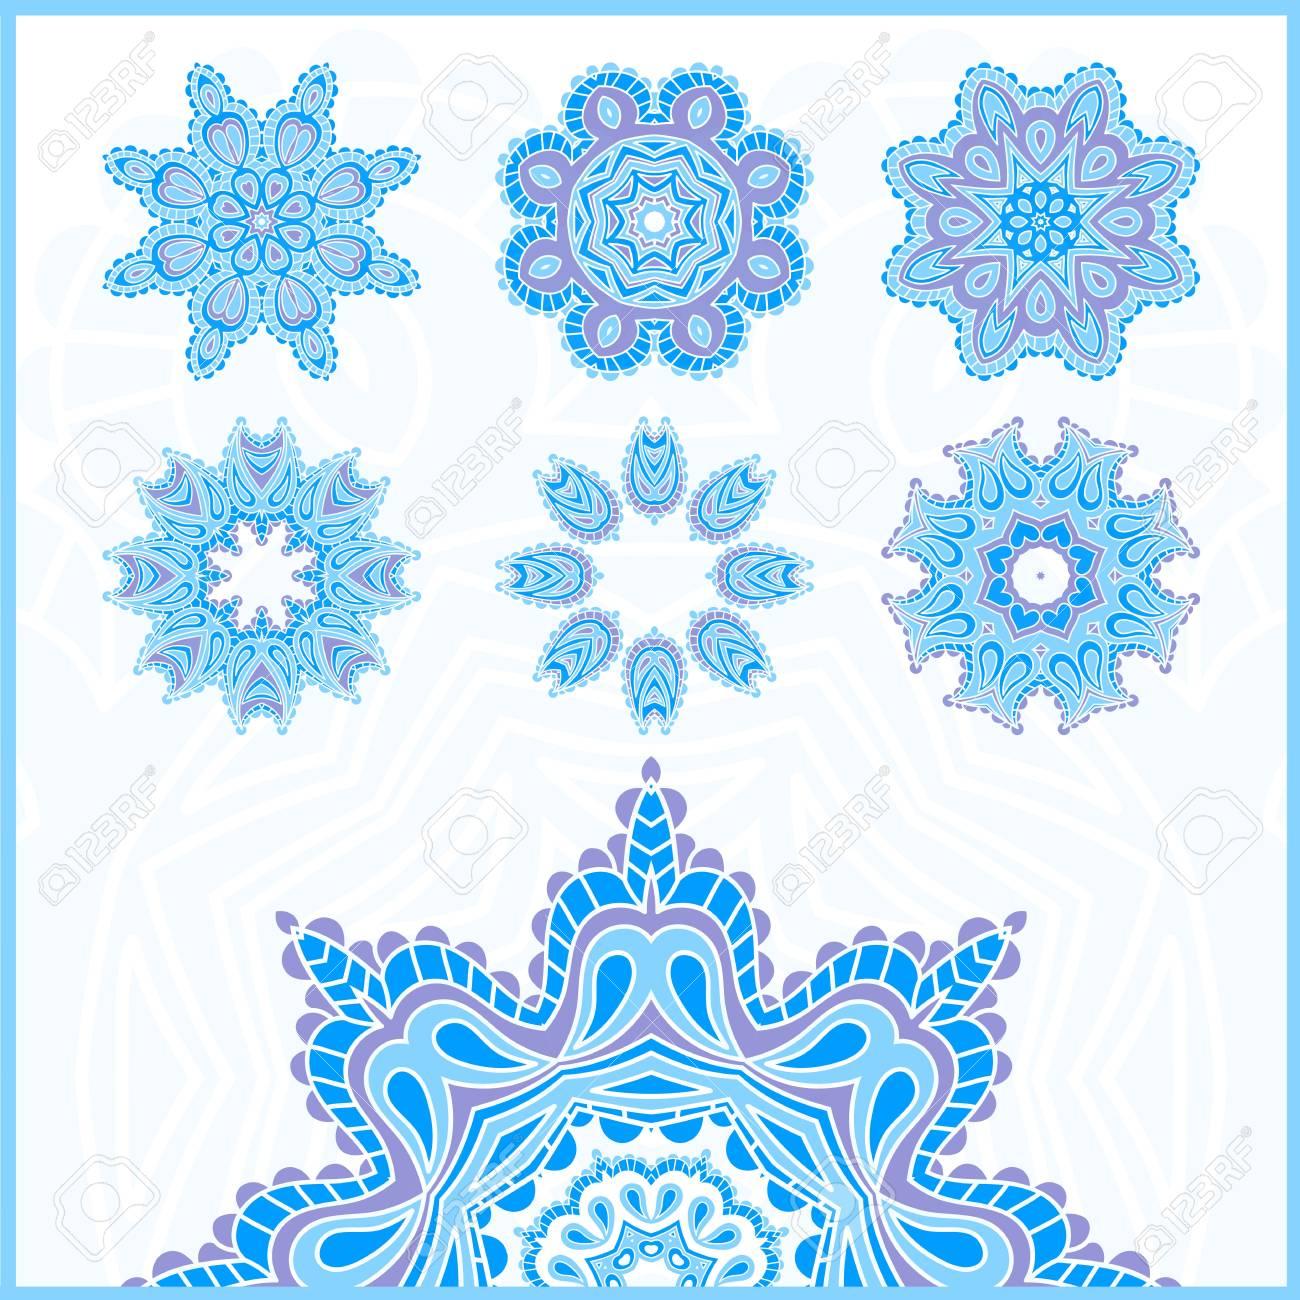 Big Set Of Christmas Snowflakes, Circular Blue Ornaments. Vintage ...